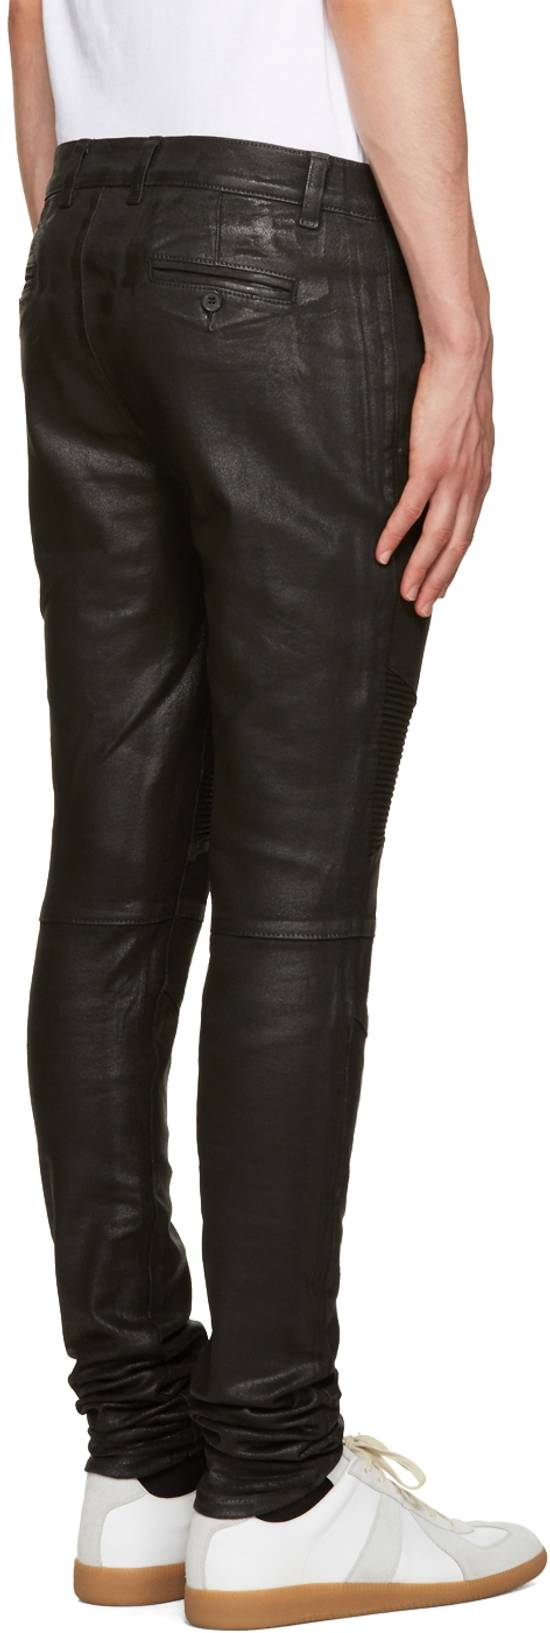 Balmain 1265$ Skinny Coated Stretch Denim Biker Jeans Size US 27 - 3